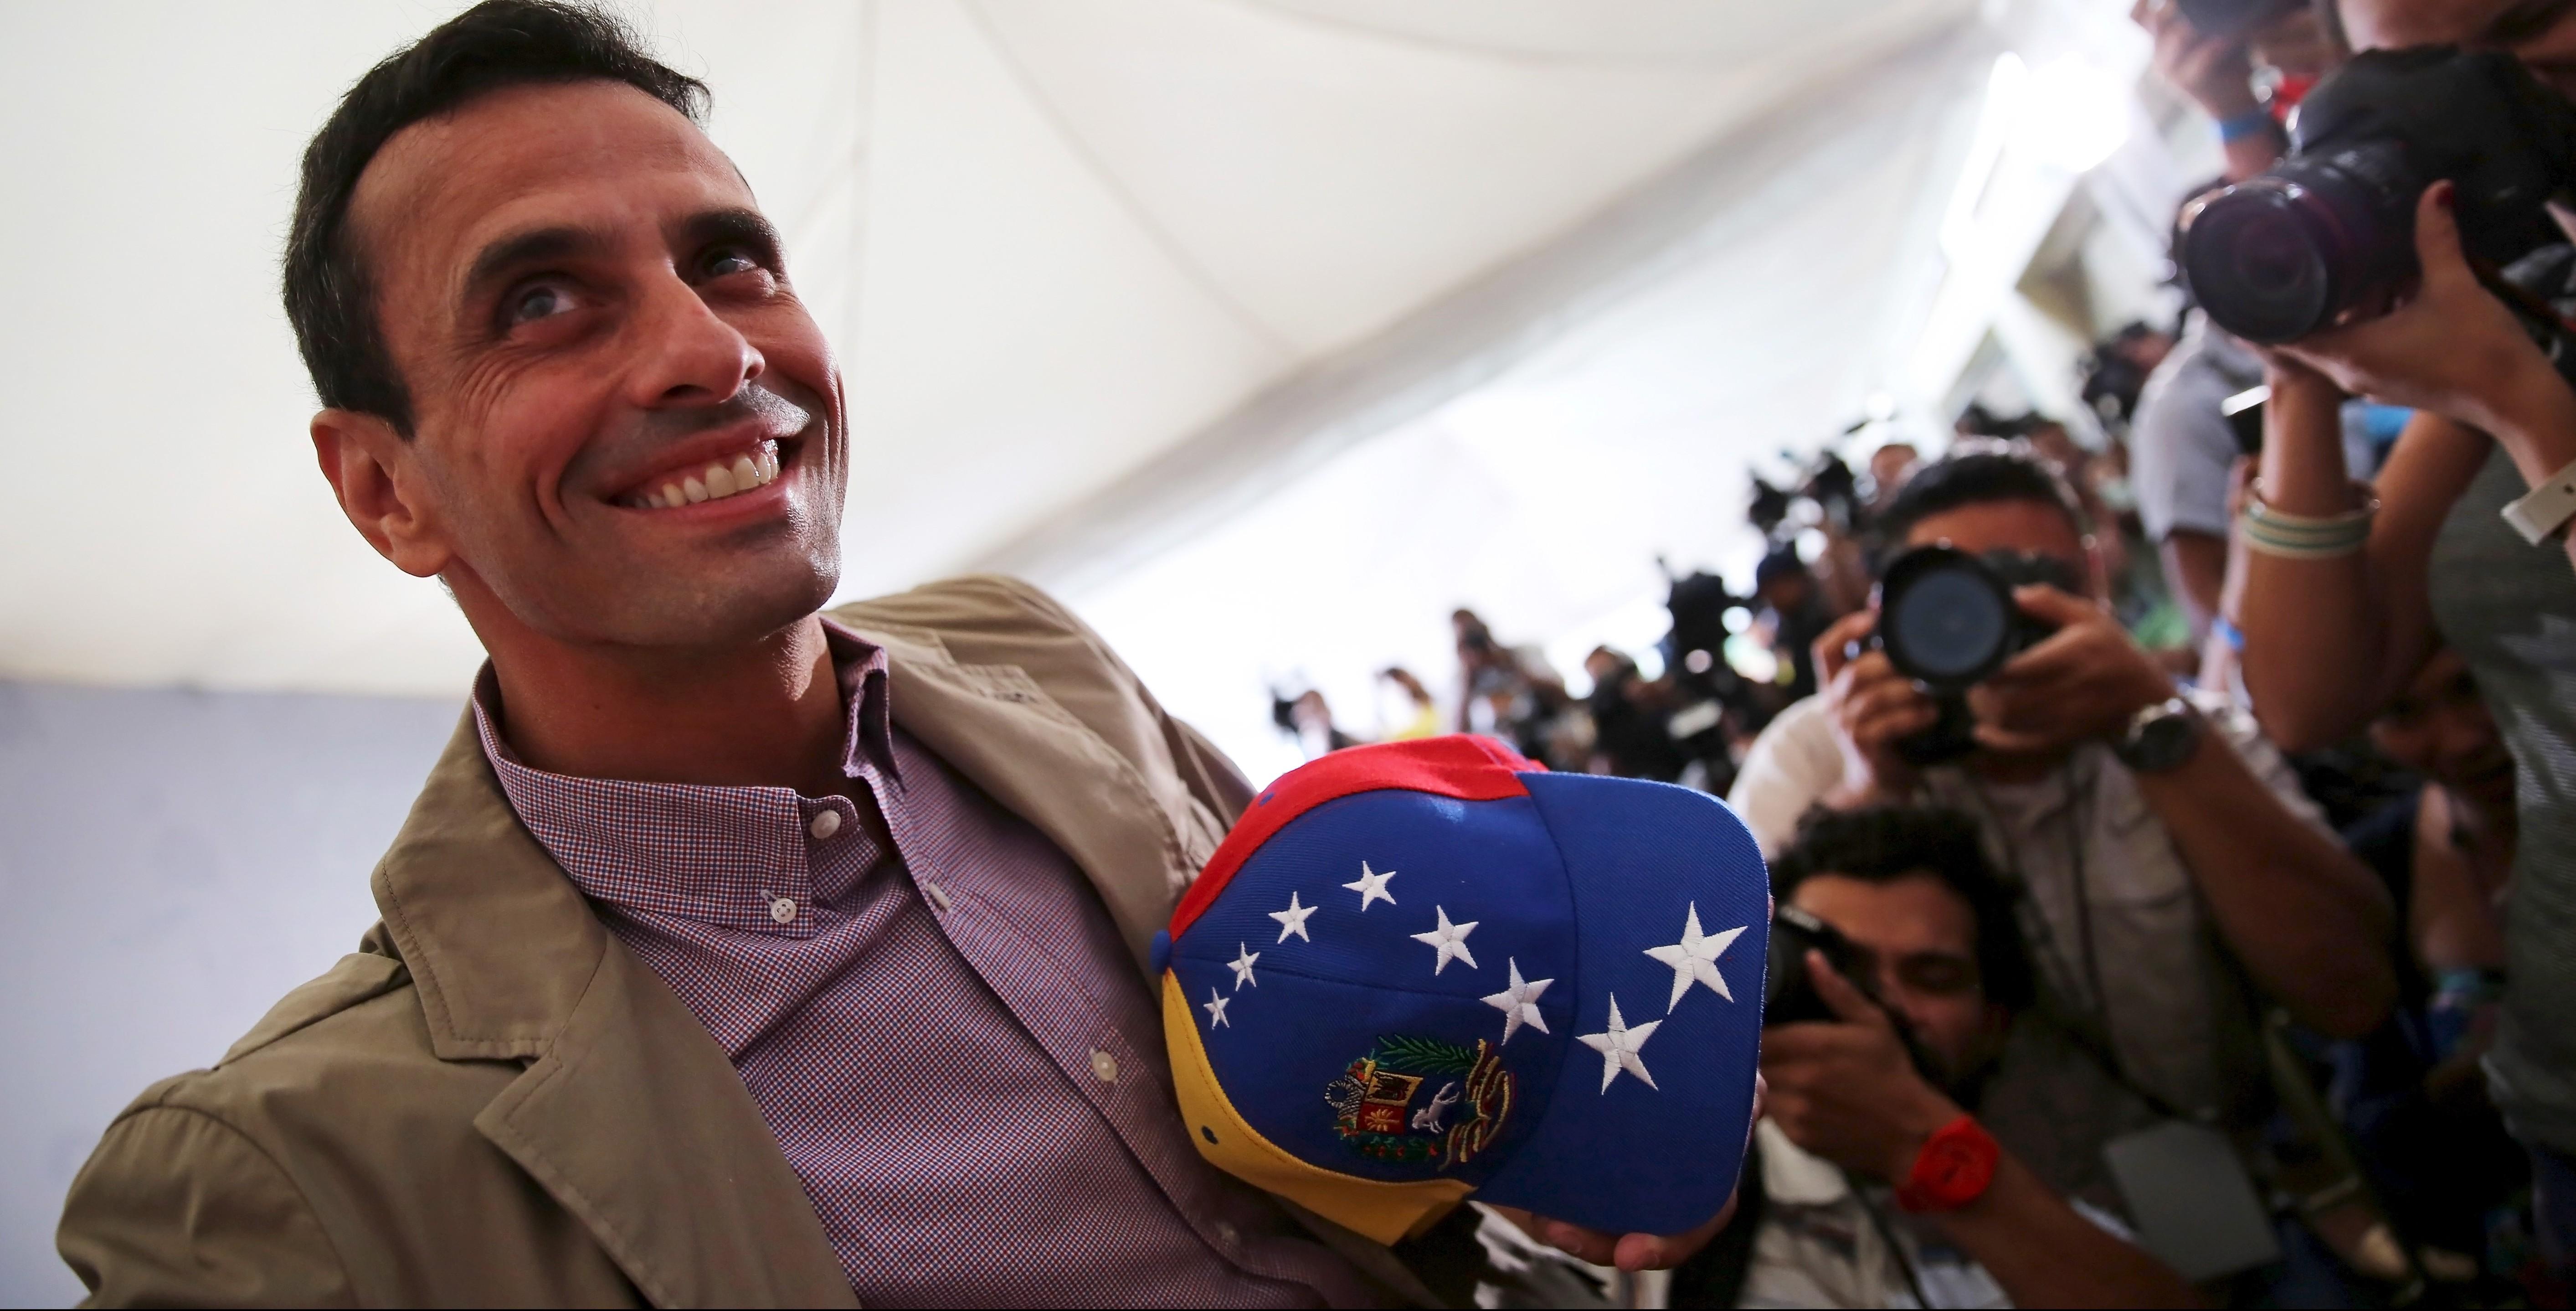 El lider opositor Henrique Capriles